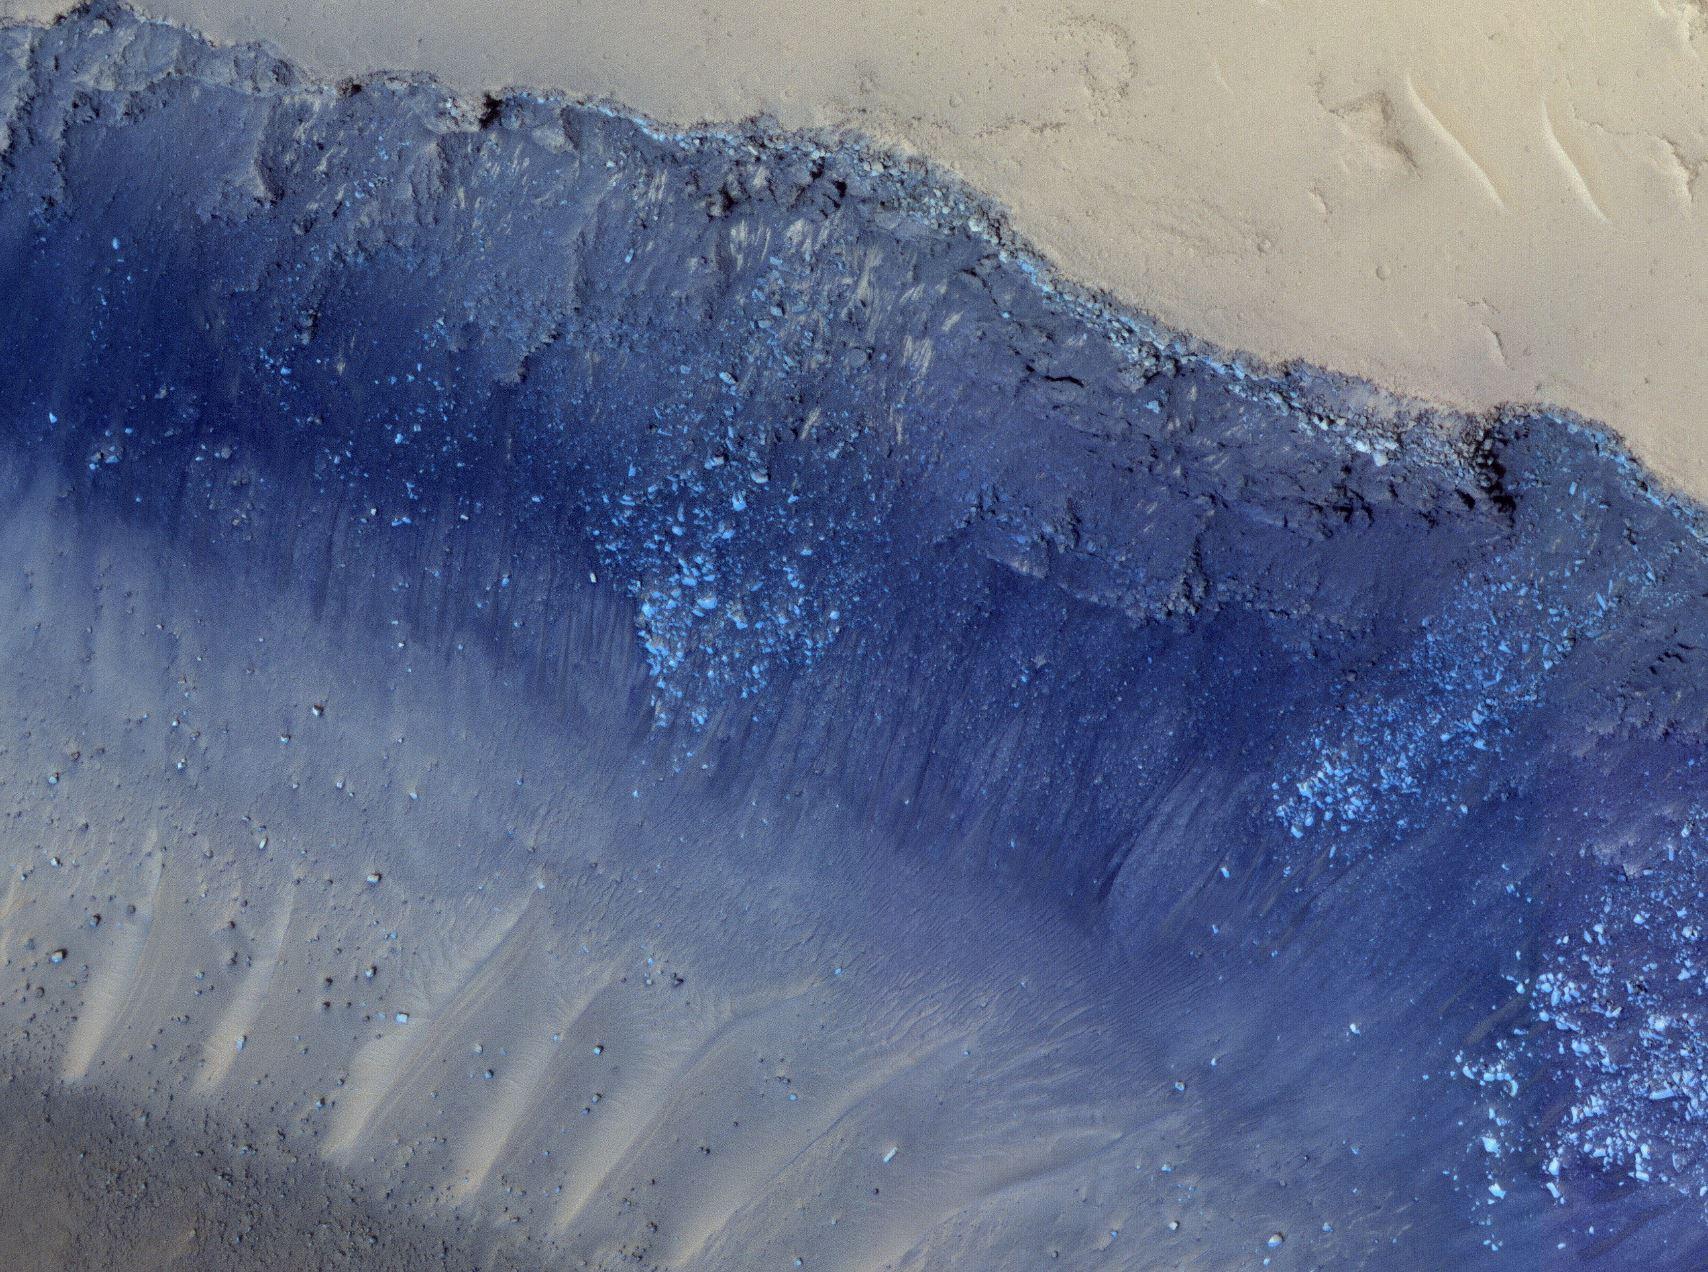 Landslides in Cerberus Fossae. - Image Credit:  NASA/JPL/U. Arizona